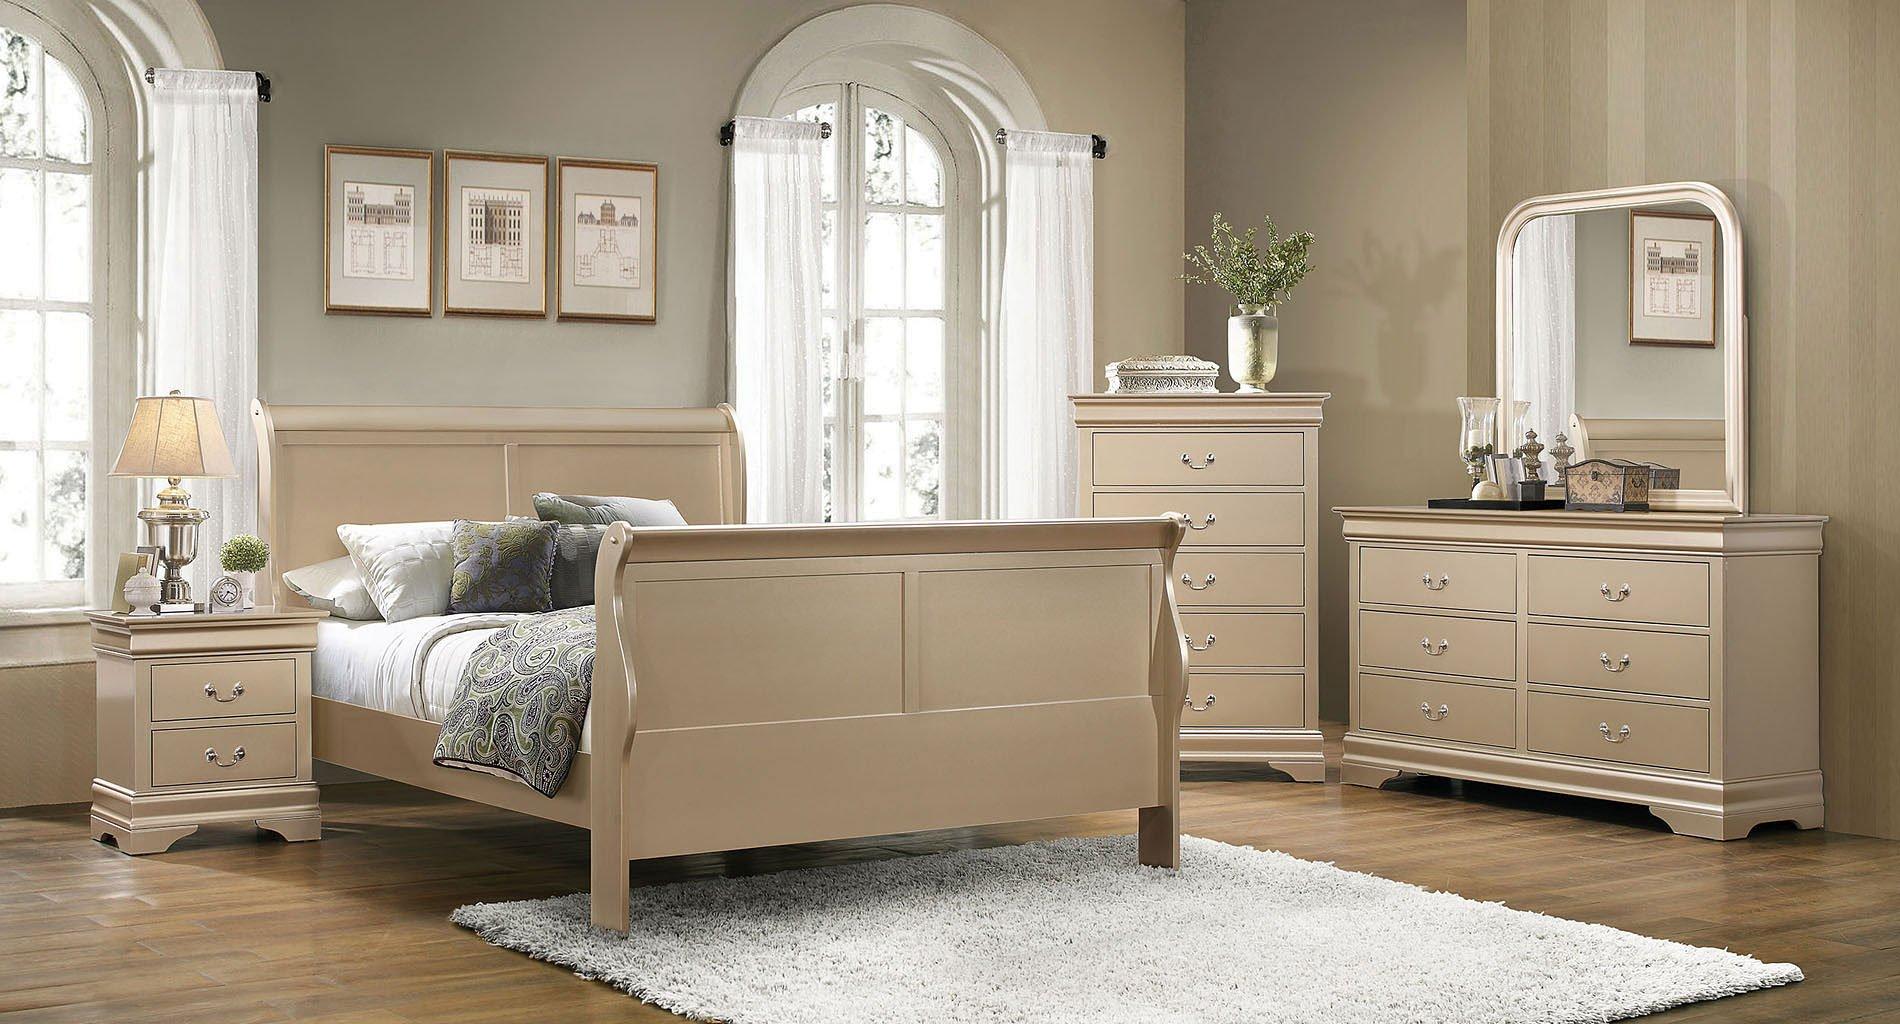 Hershel Louis Philippe Bedroom Set (Champagne) Coaster Furniture ...